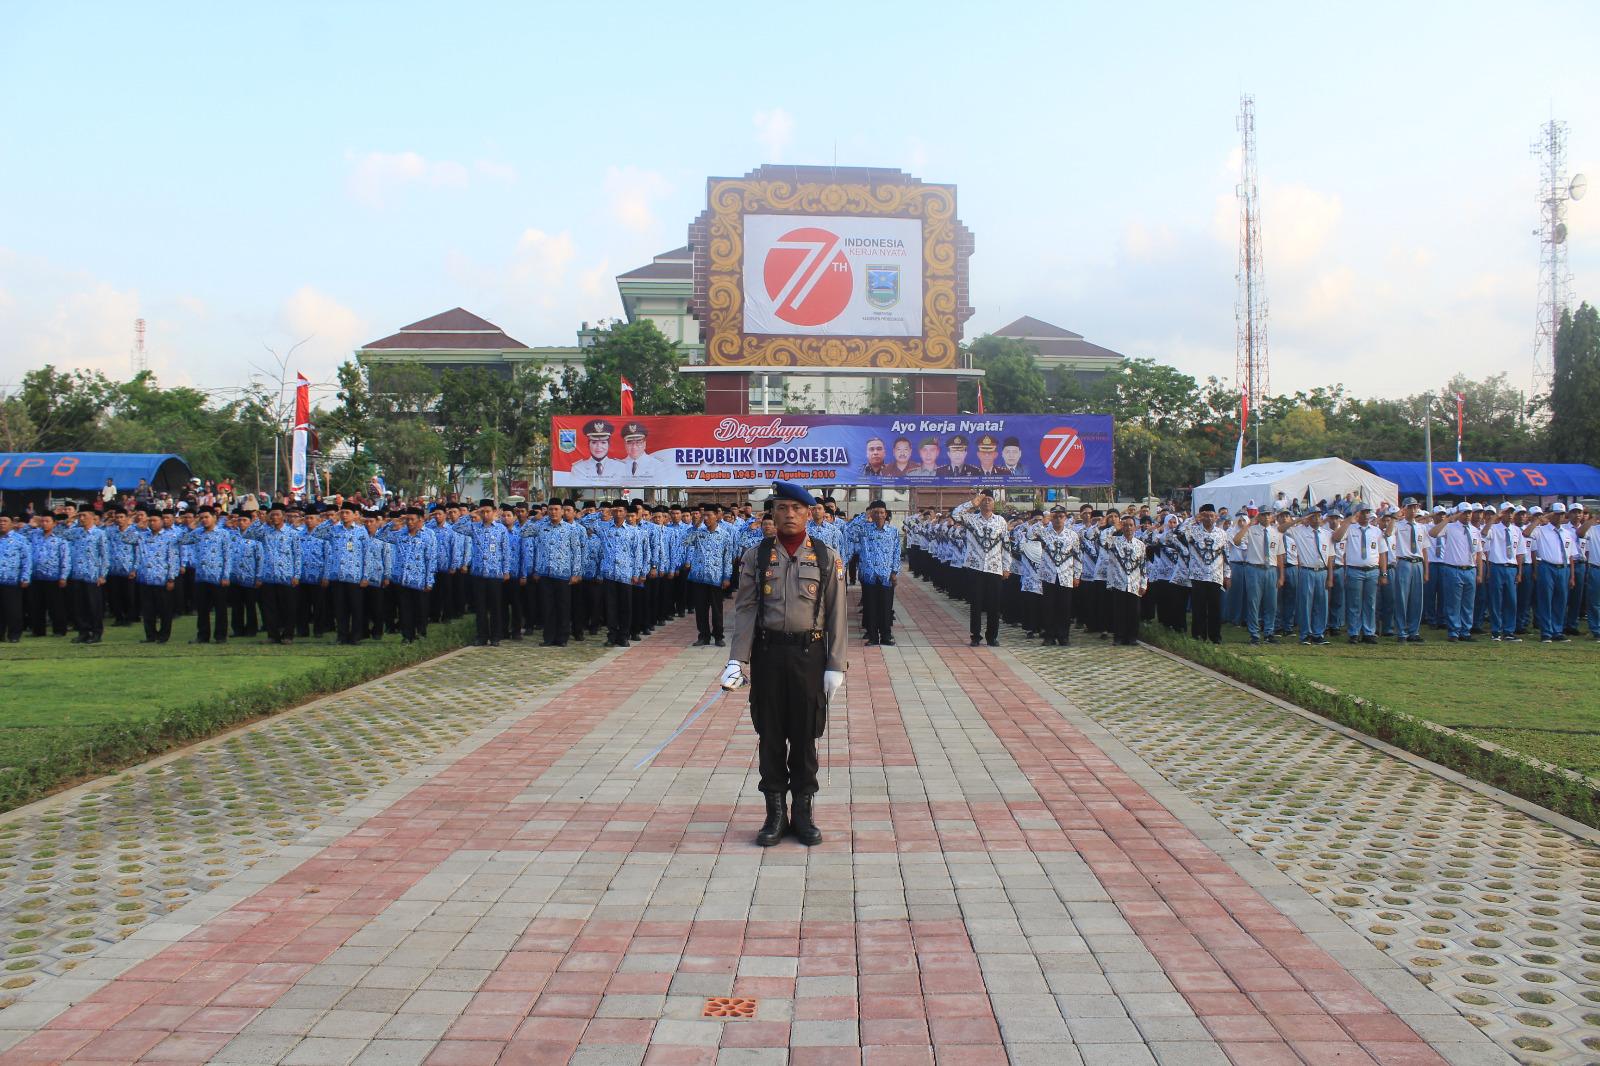 Tribrata News Polres Probolinggo Kapolres Prooblinggo Pimpin Bertindak Sebagai Inspektur